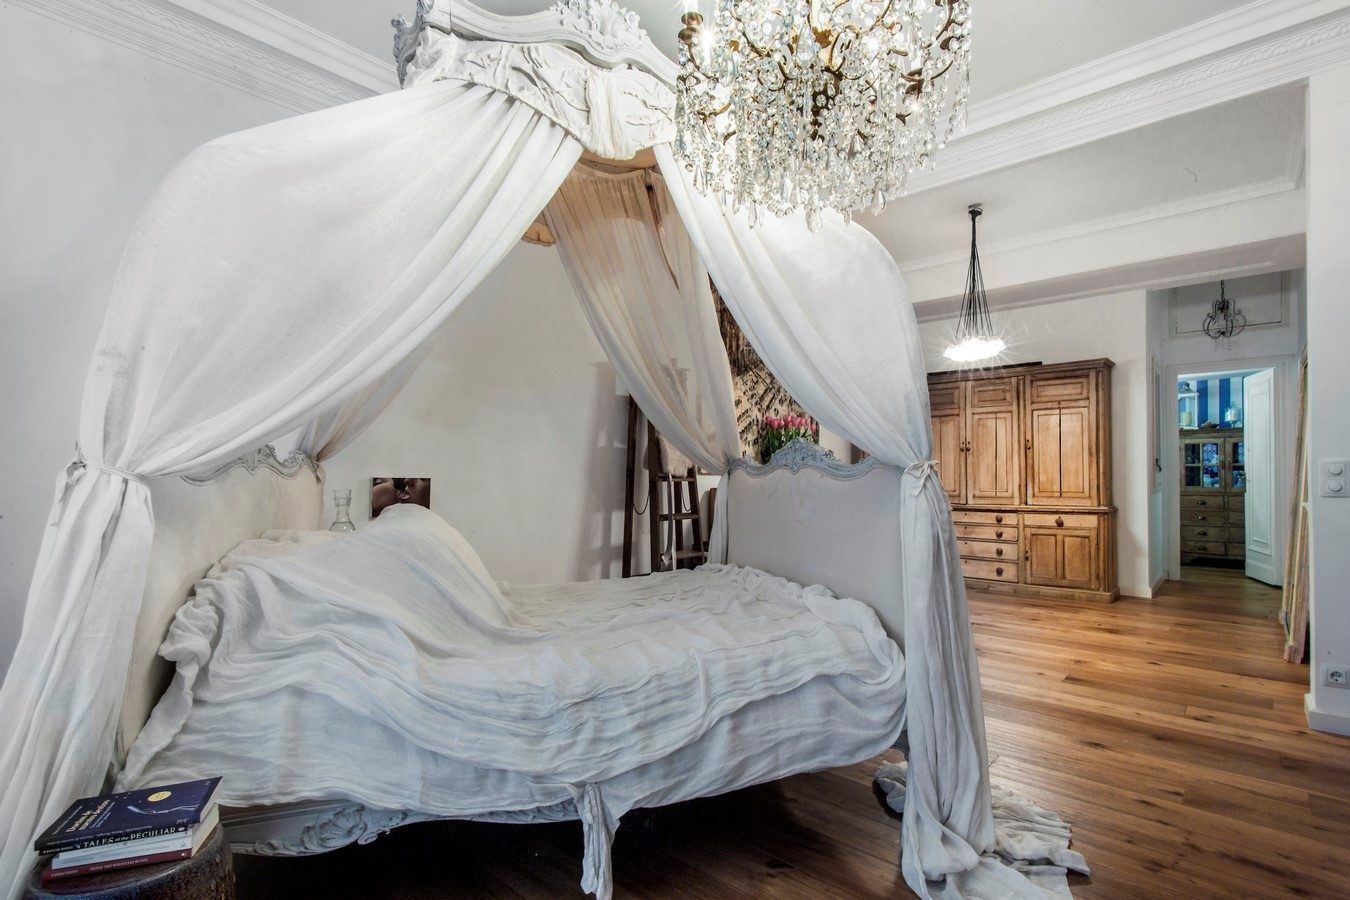 Pau Casals Apartment by Ana Engelhorn Interior Design Ltd - Sheet2